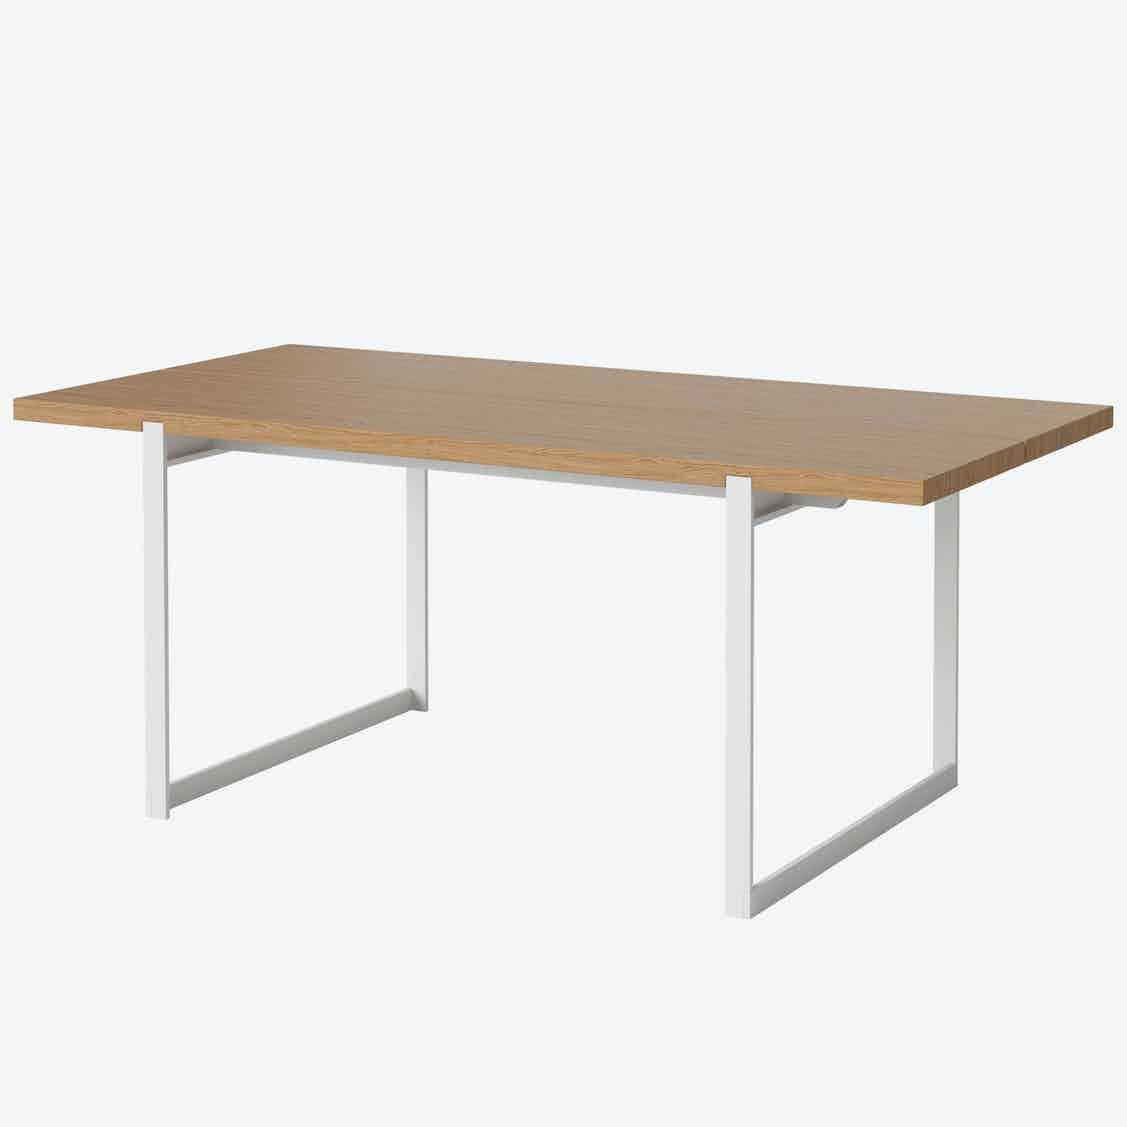 Bolia frame dining table haute living